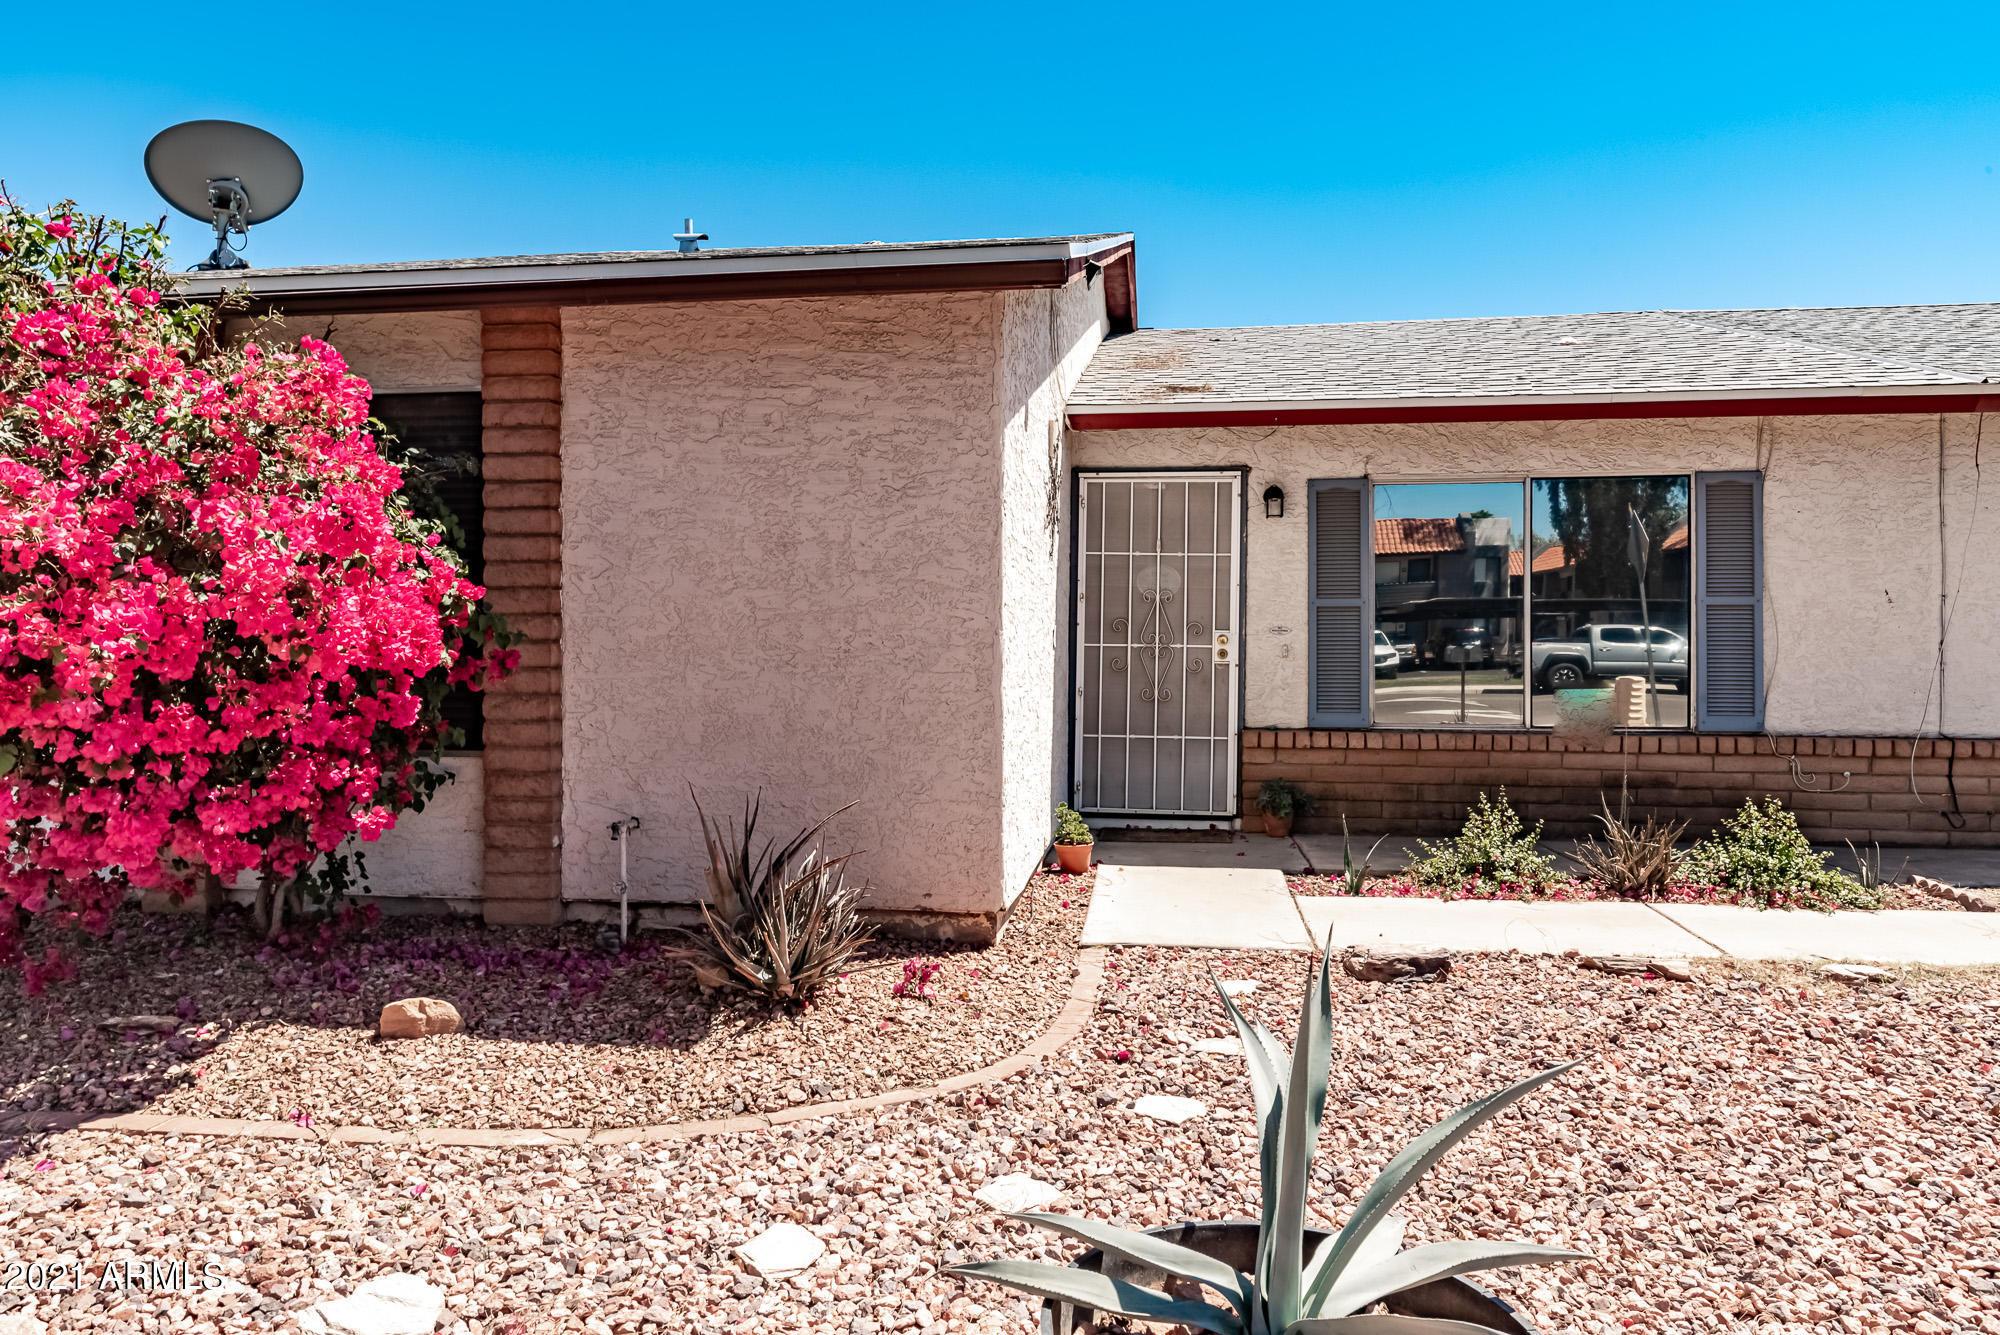 5131 EUGIE Avenue, Glendale, Arizona 85304, 3 Bedrooms Bedrooms, ,2 BathroomsBathrooms,Residential,For Sale,EUGIE,6229876